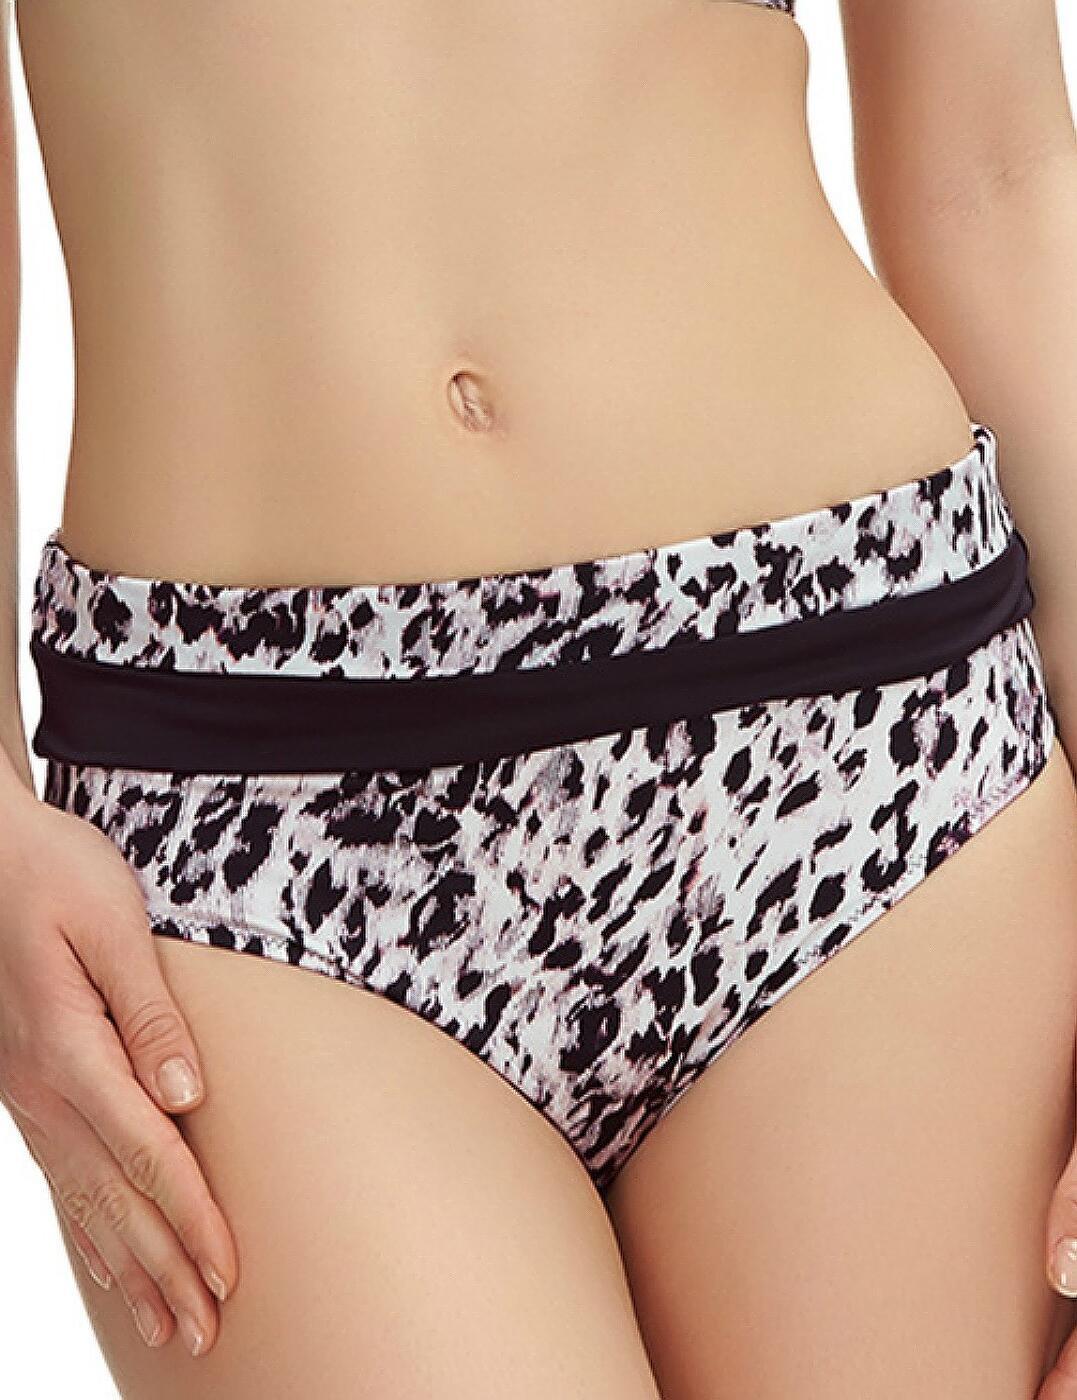 6307 Fantasie Masai Mara Classic Fold Bikini Brief - 6307 Black